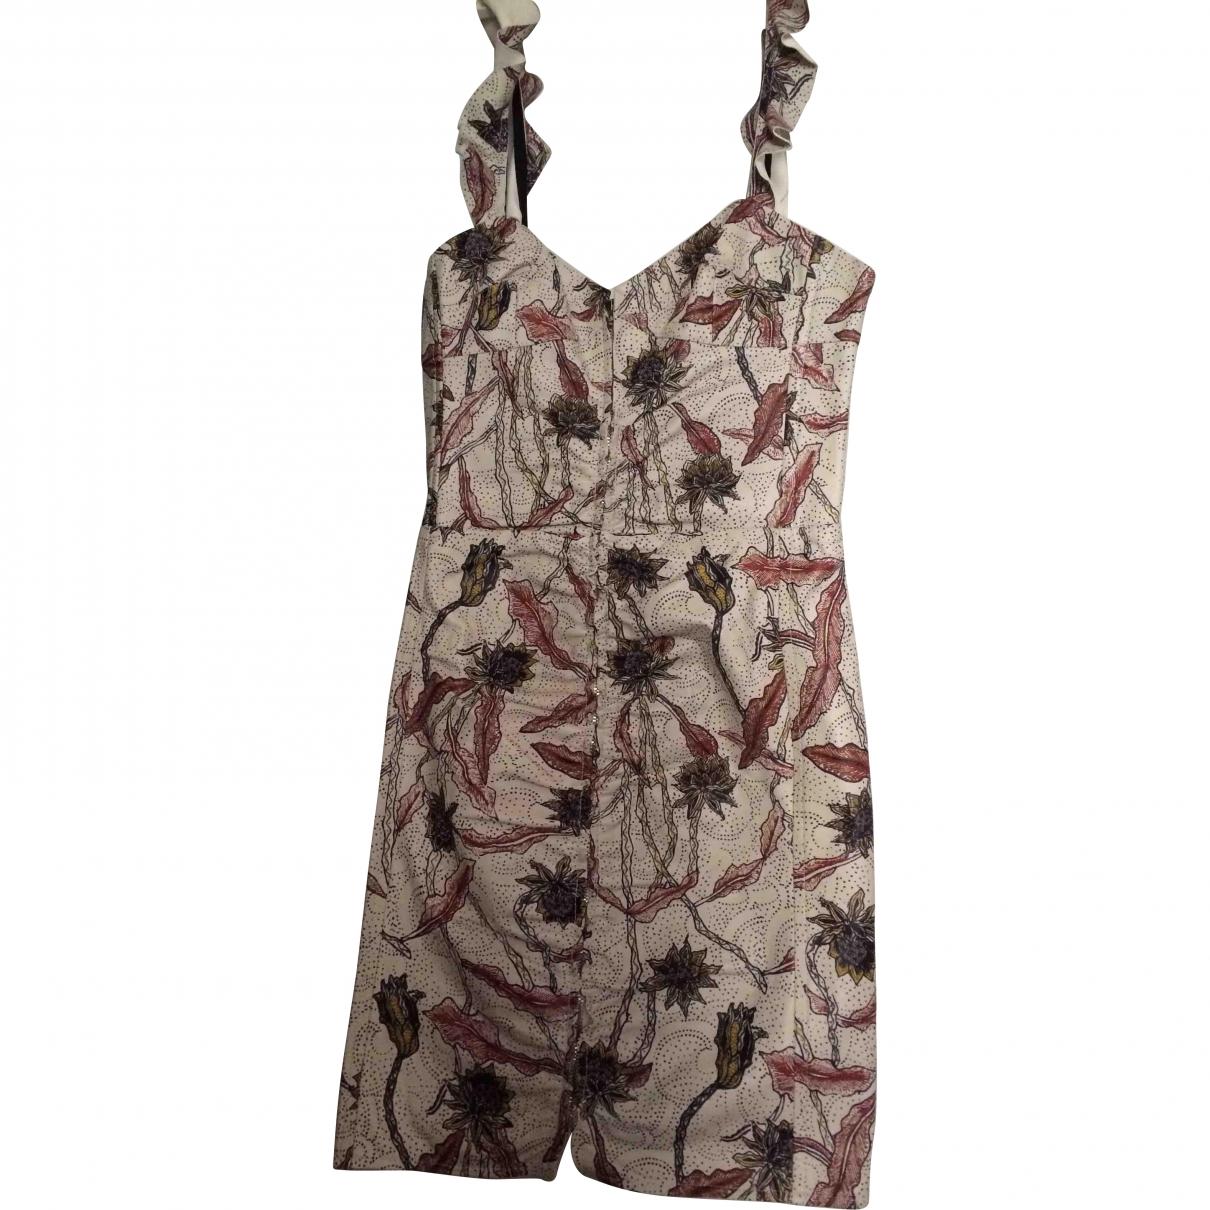 Isabel Marant \N Beige Leather dress for Women 36 FR